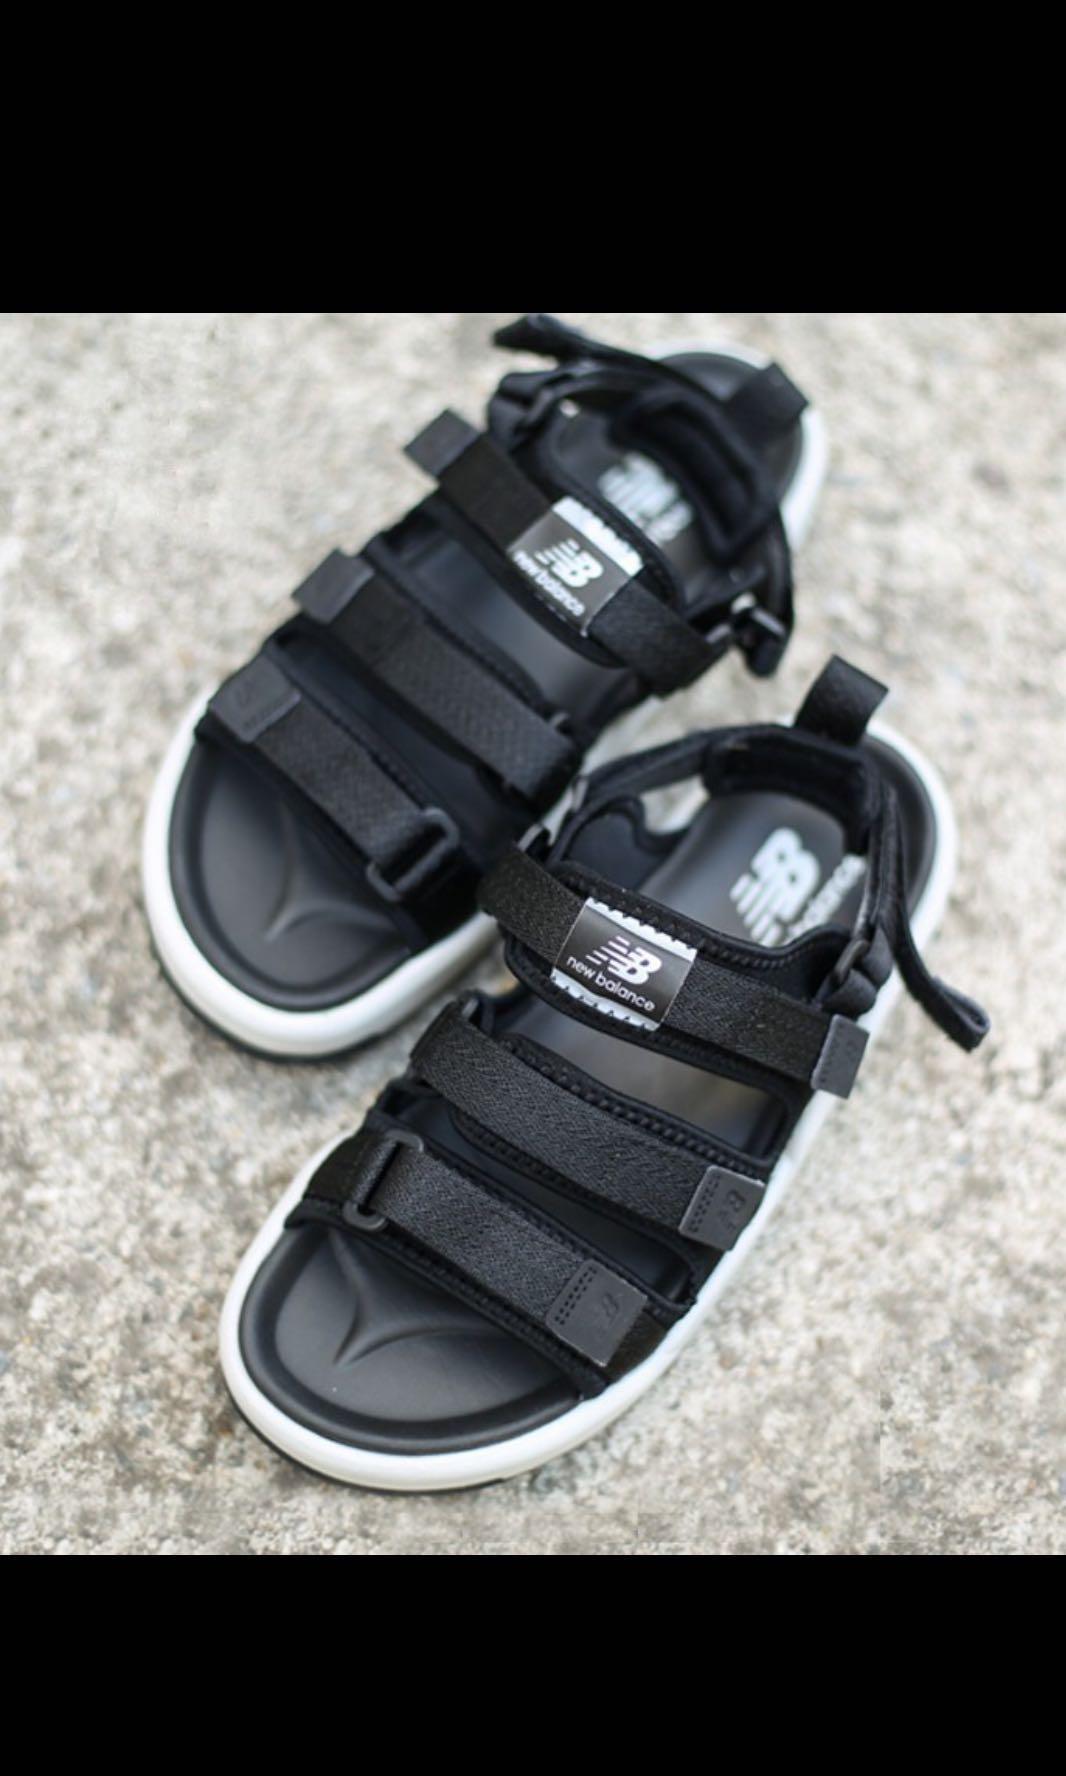 3b1569d310da9 New Balance Sandal, Men's Fashion, Footwear, Slippers & Sandals on ...